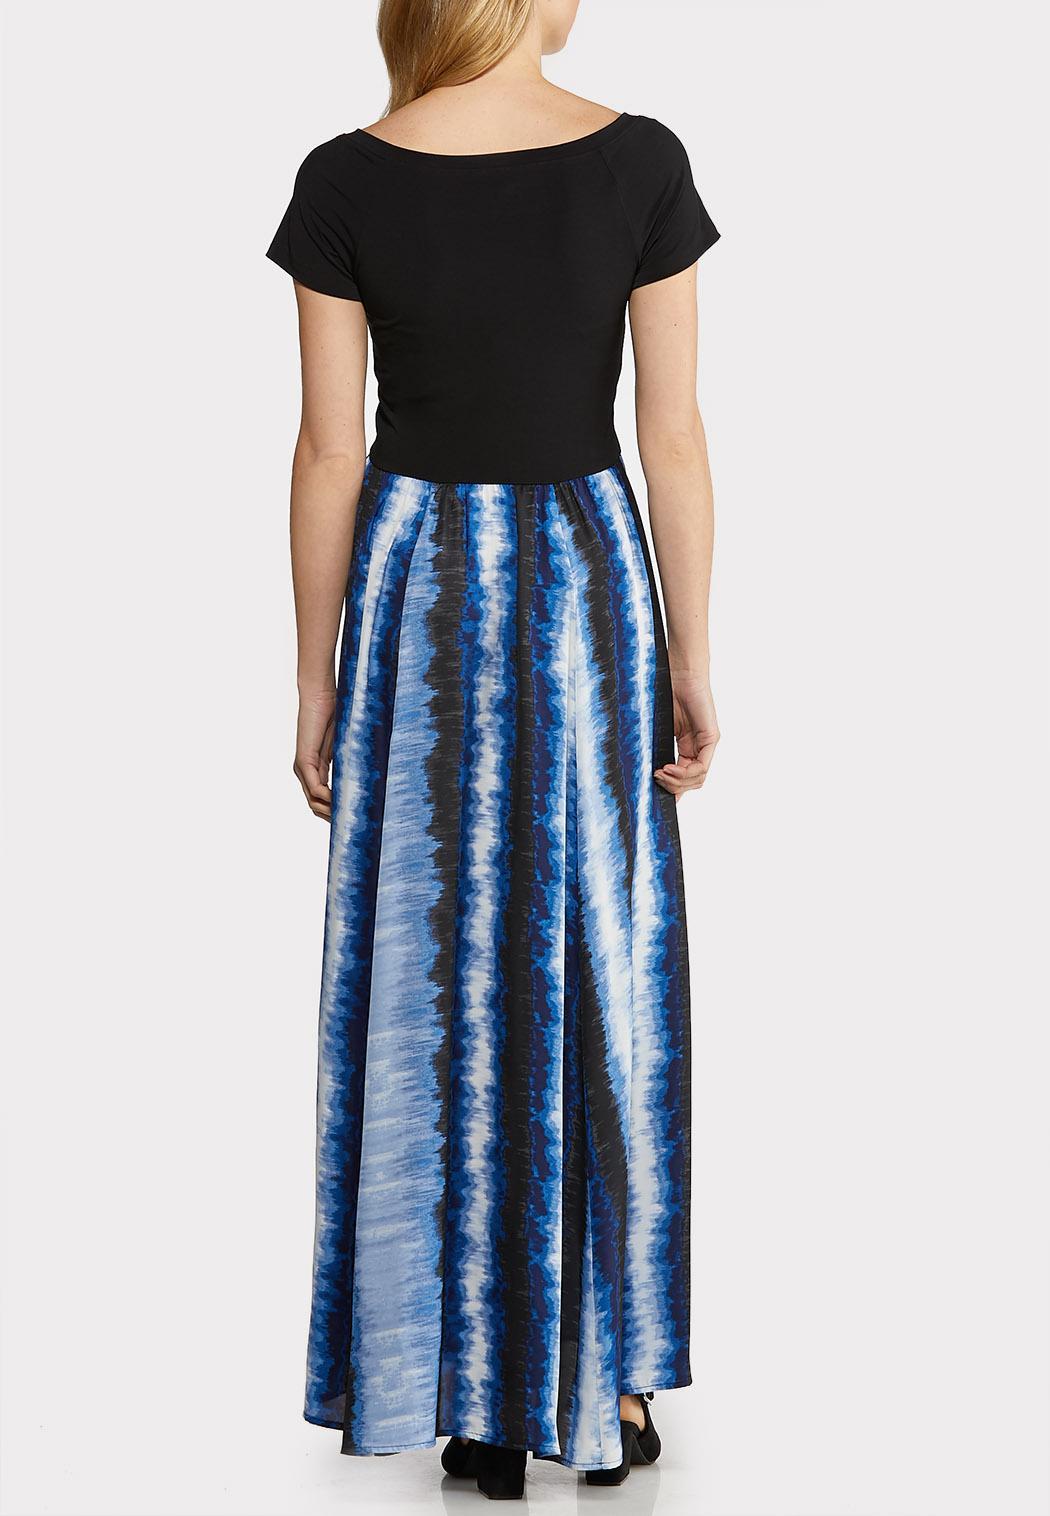 Plus Petite Solid Tie Dye Maxi Dress (Item #44140909)